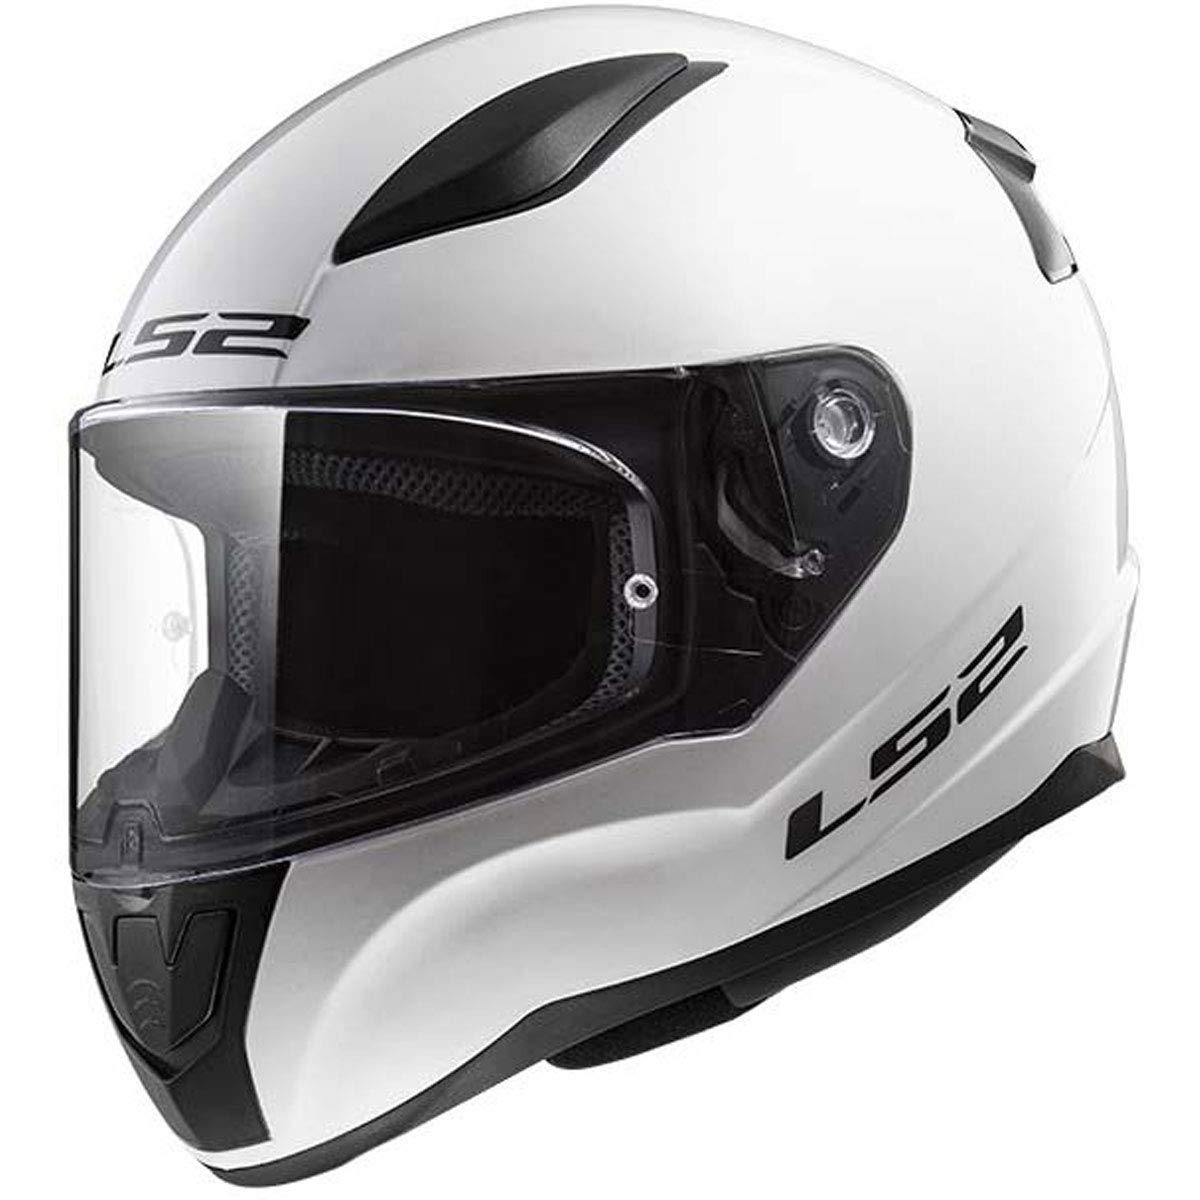 353-1024 LS2 Rapid Helmet GLOSS WHITE LARGE